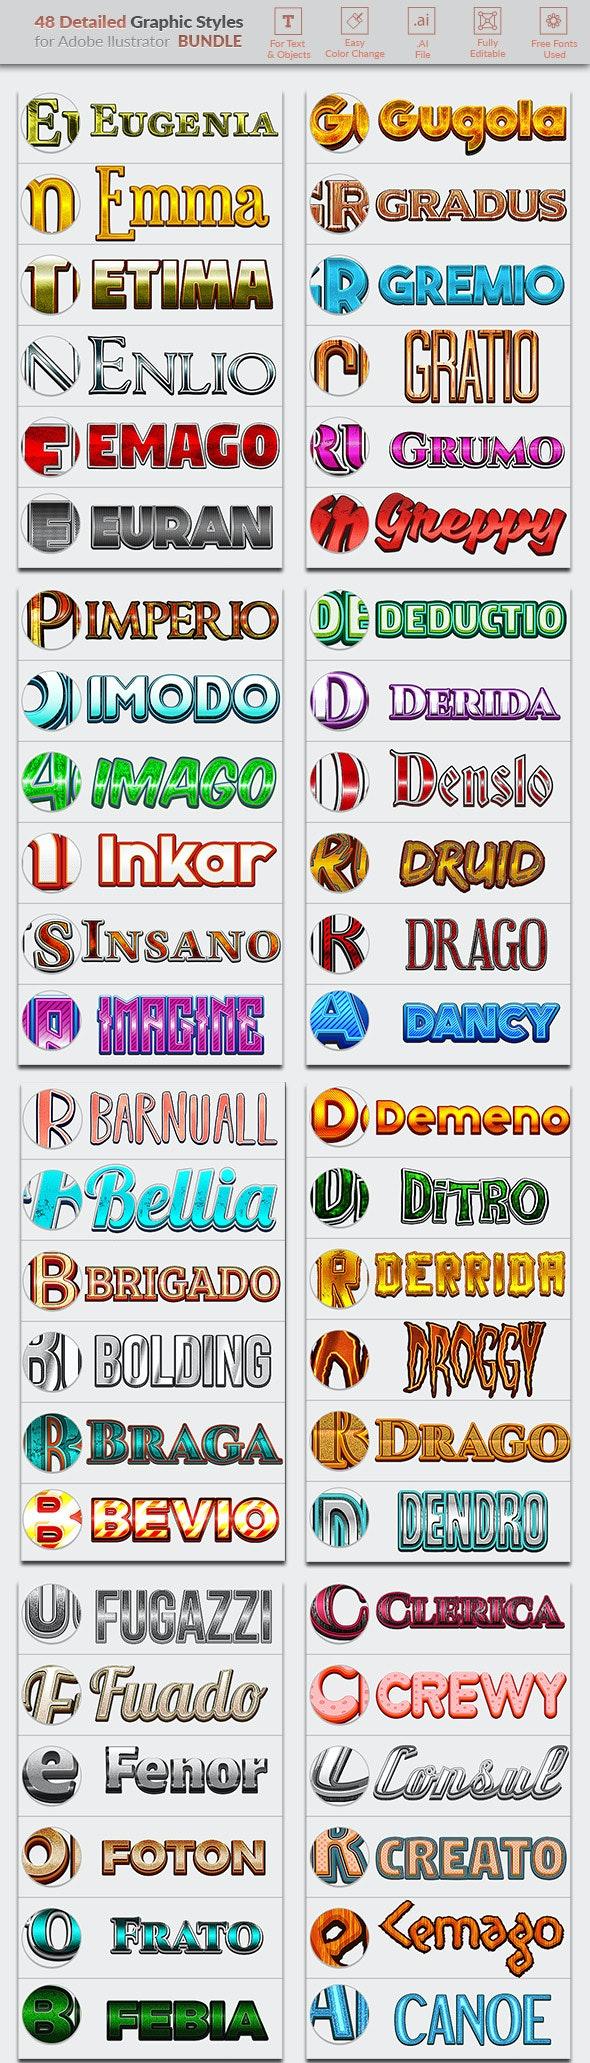 48 Detailed Graphic Styles — Mega Pack - Styles Illustrator